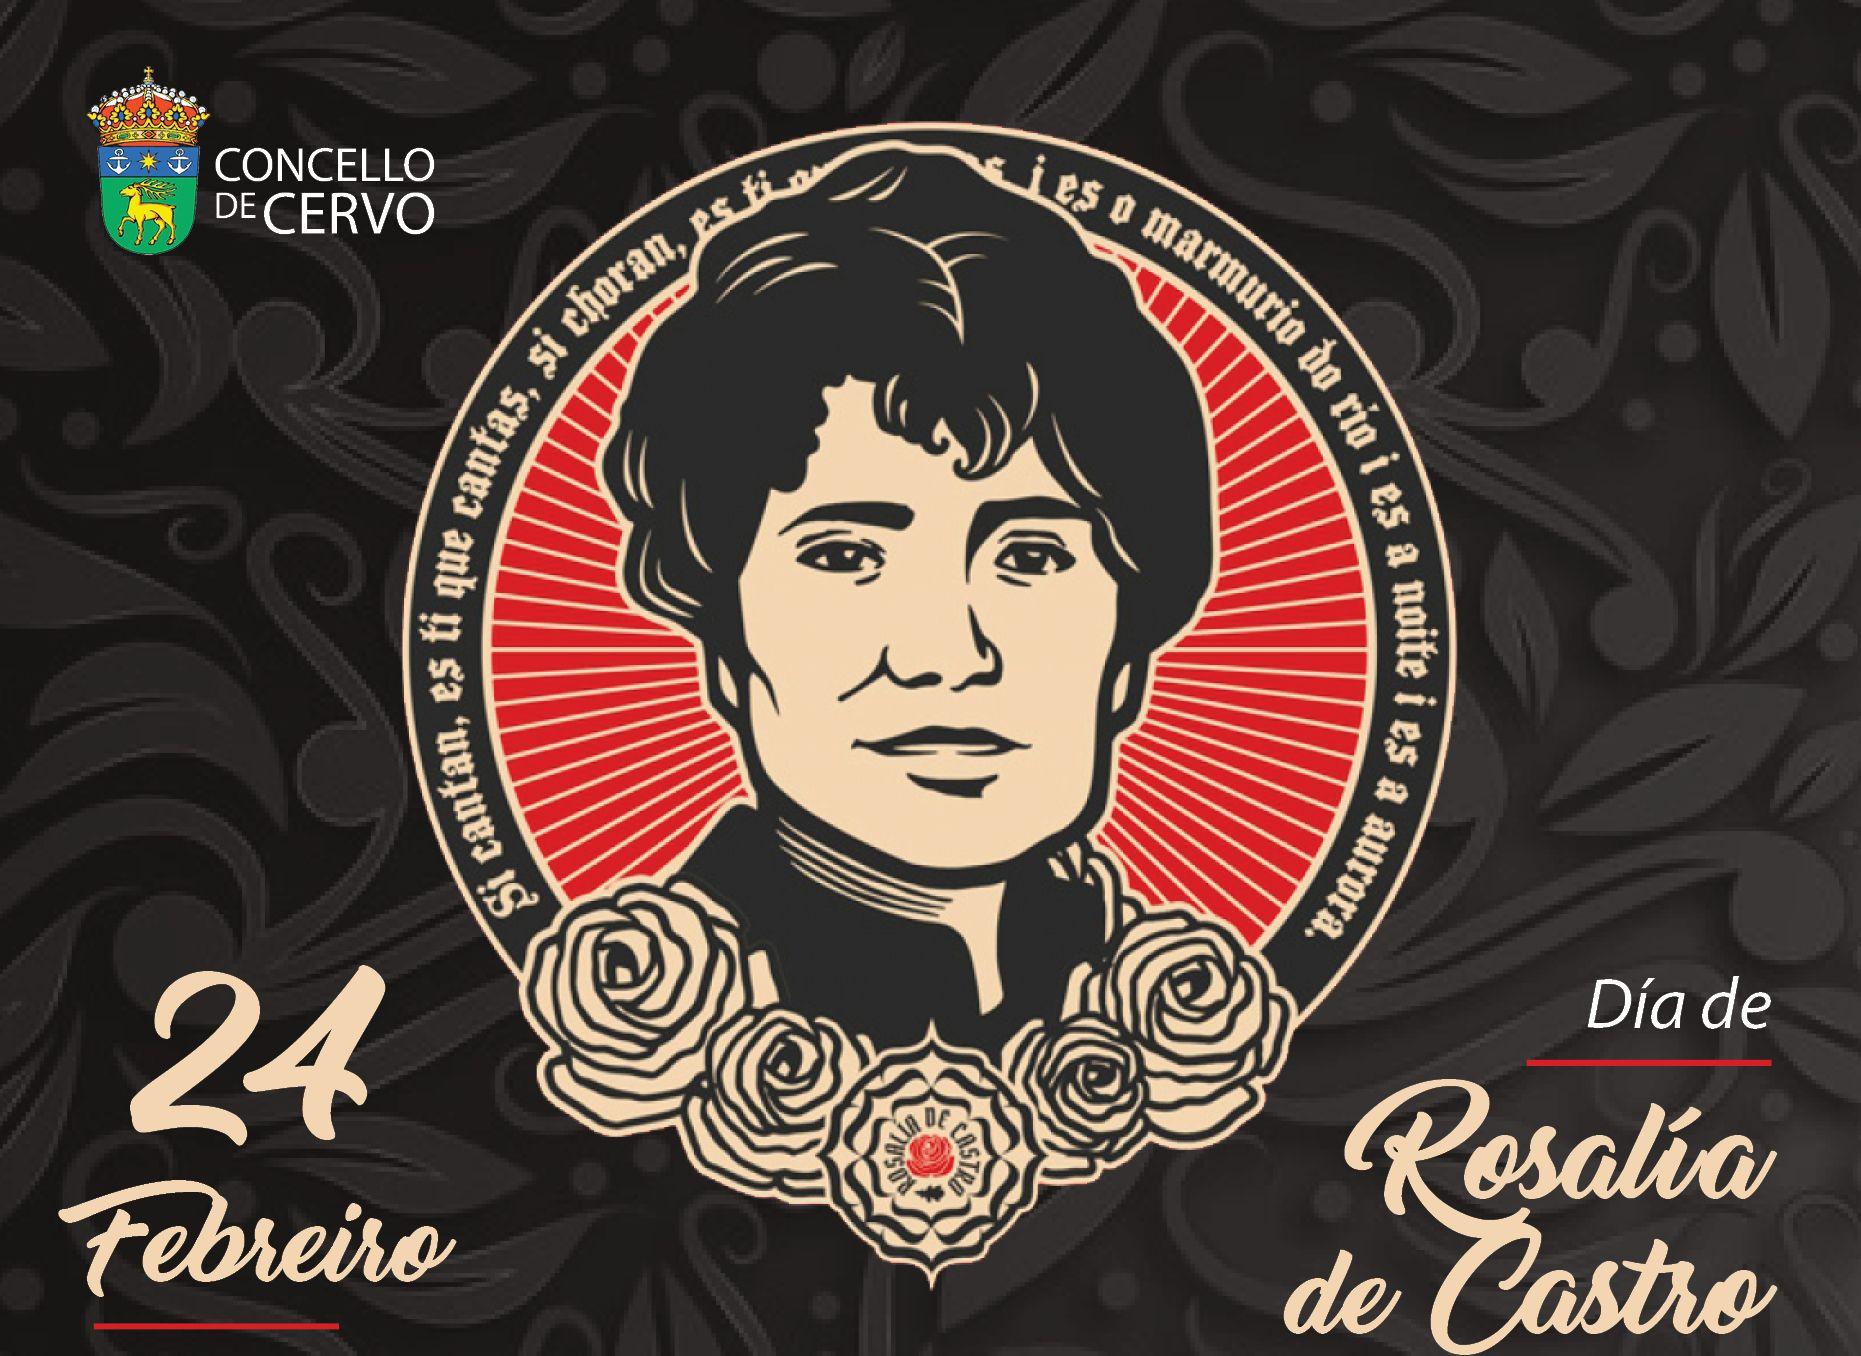 Día de Rosalía no Concello de Cervo